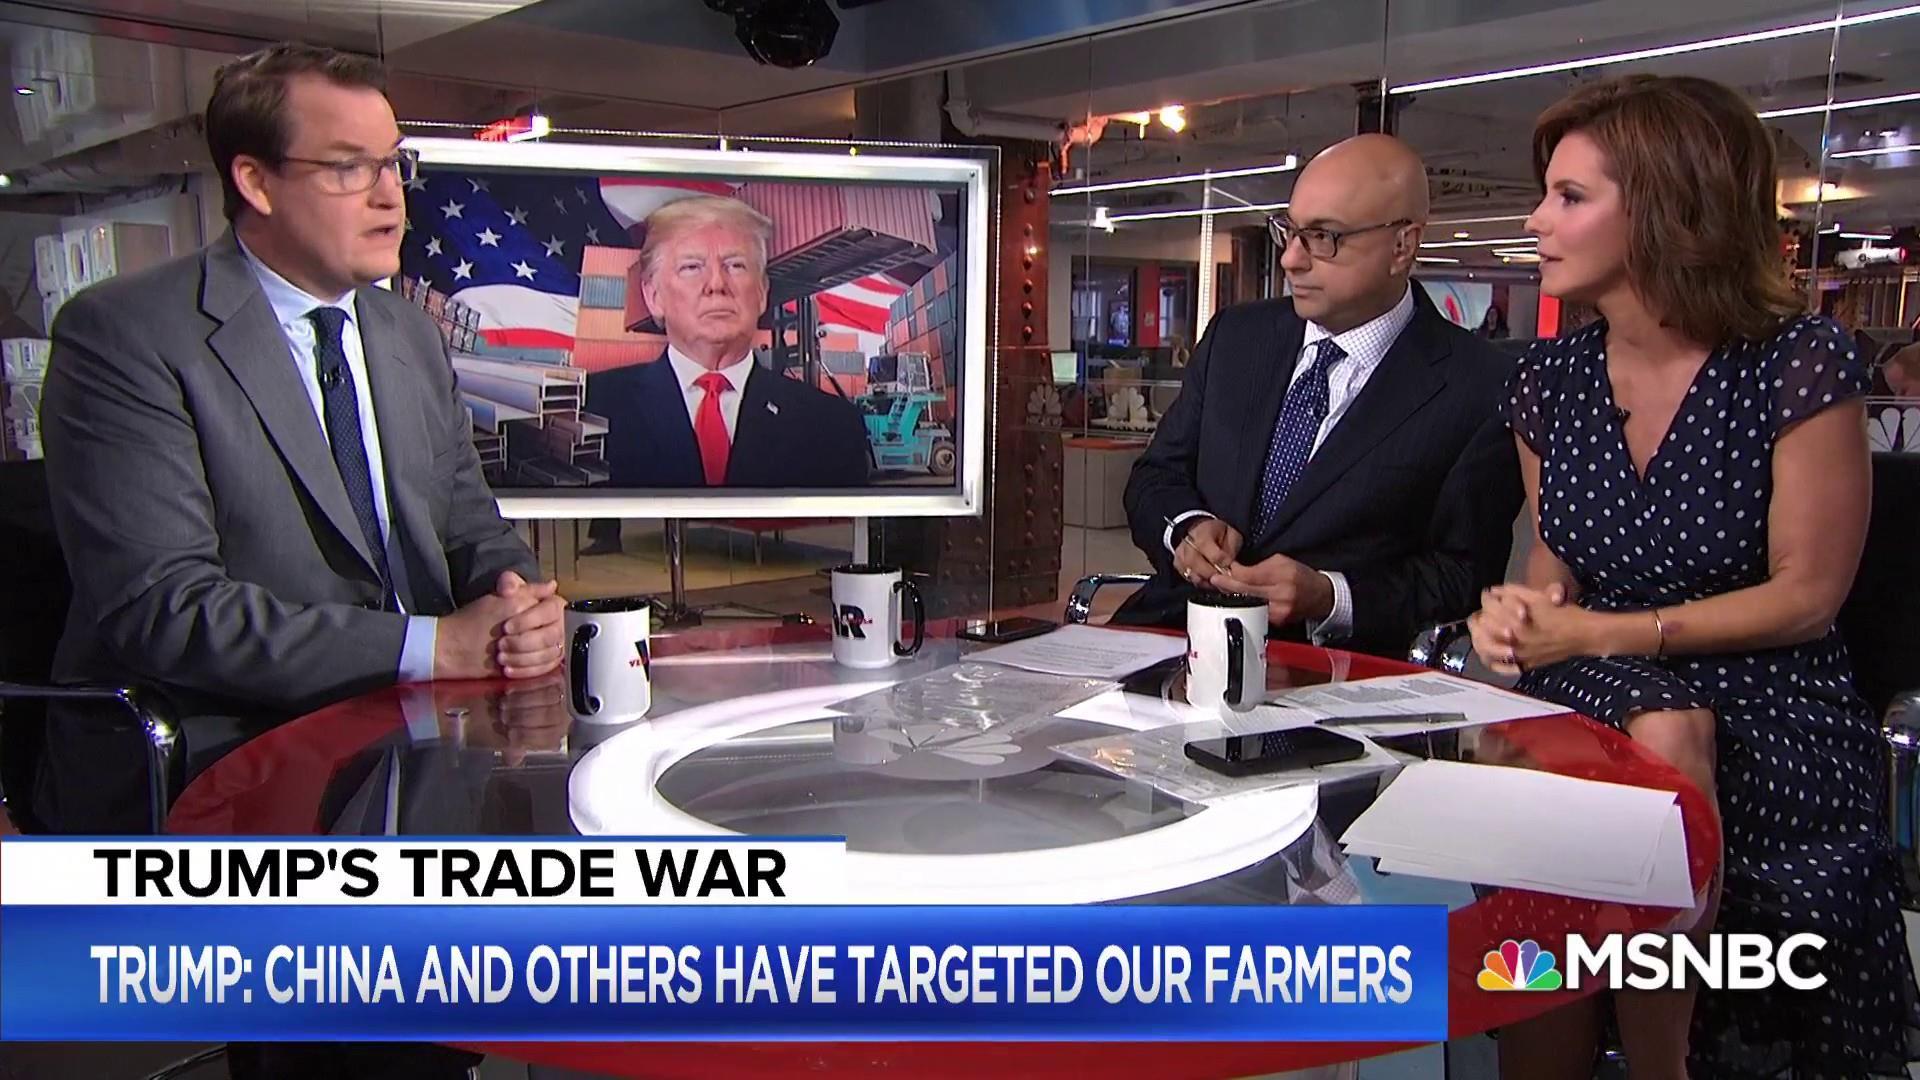 For Fact's Sake: Tariffs might kill jobs